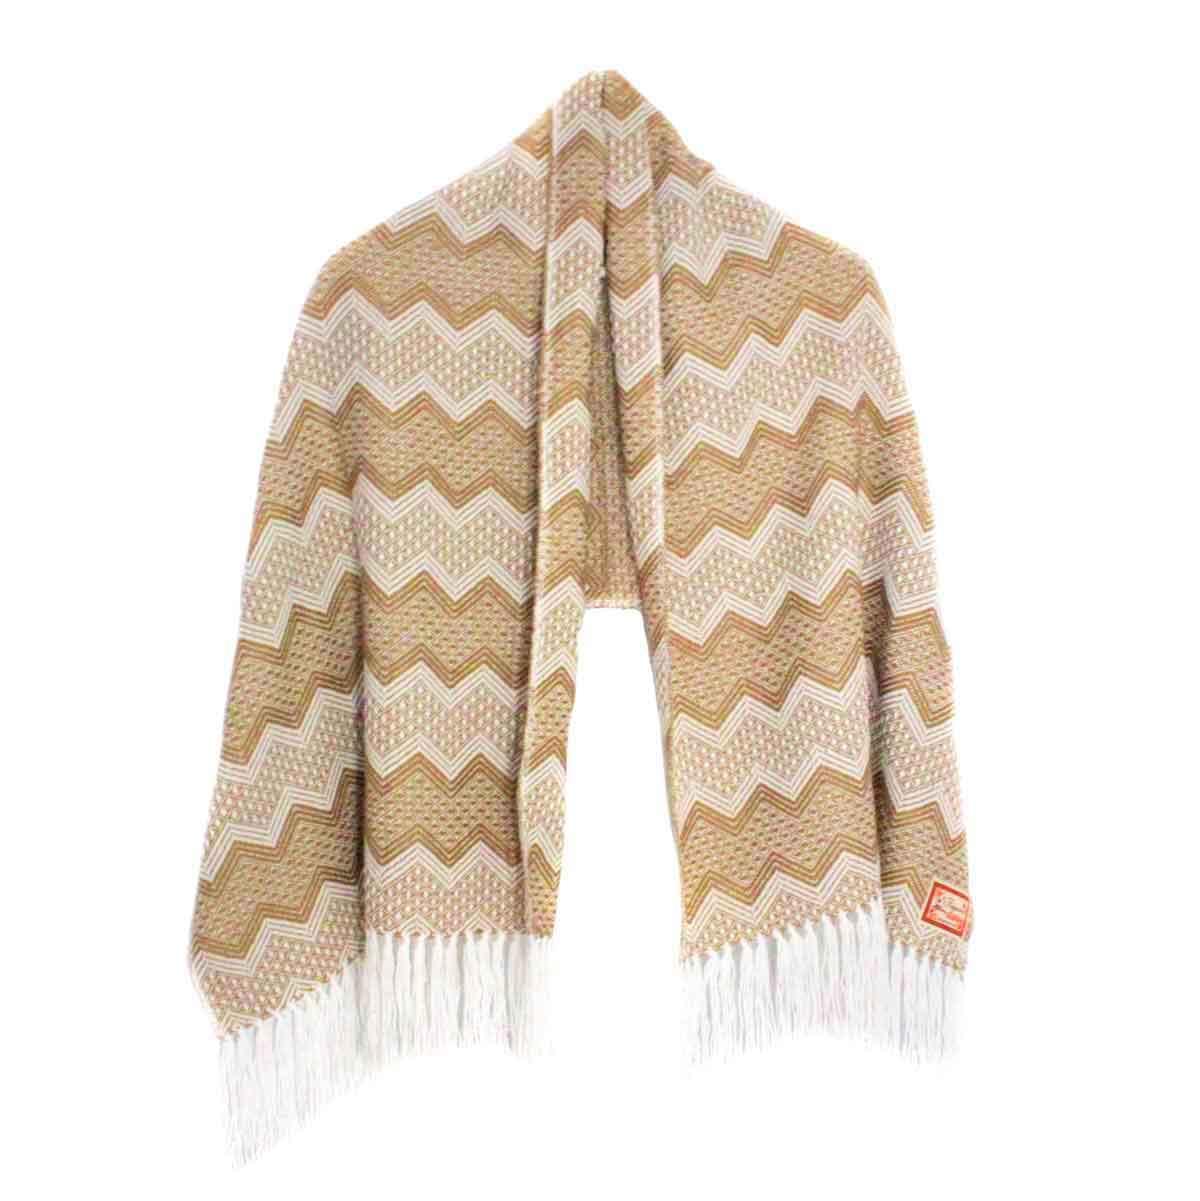 Inka-Products-Châle SAYTU-Beige motifs ethniques-2